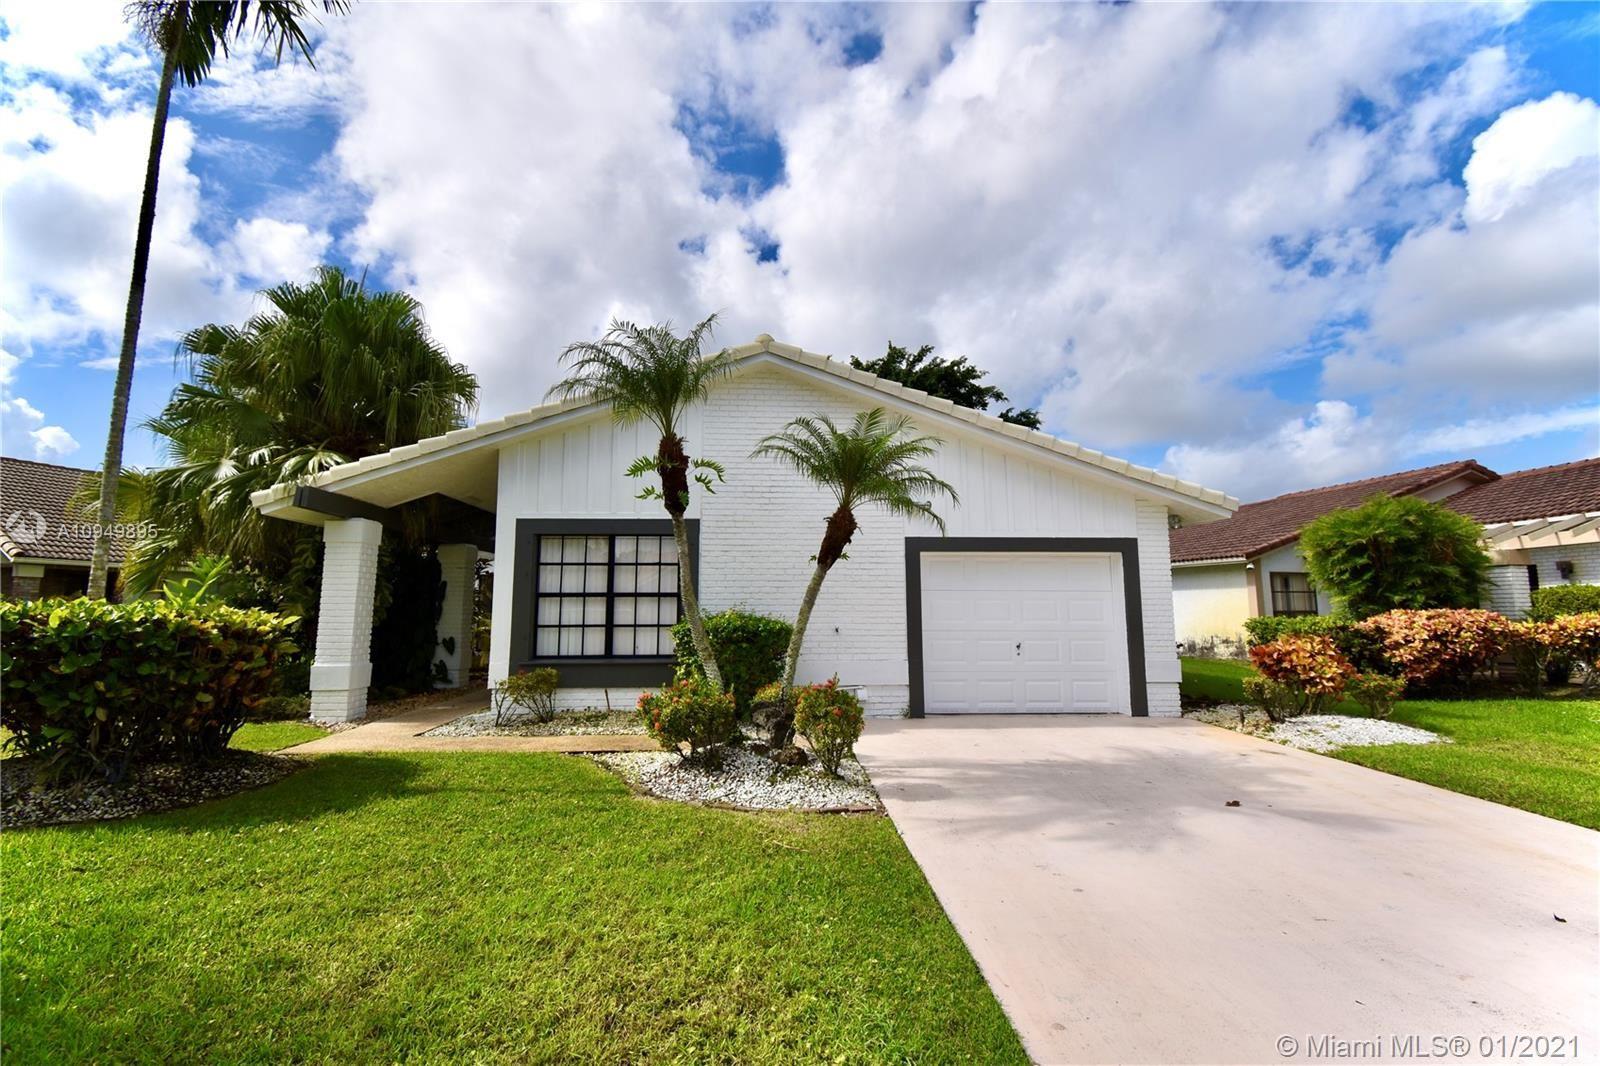 10108 Camelback Ln, Boca Raton, FL 33498 - #: A10949895